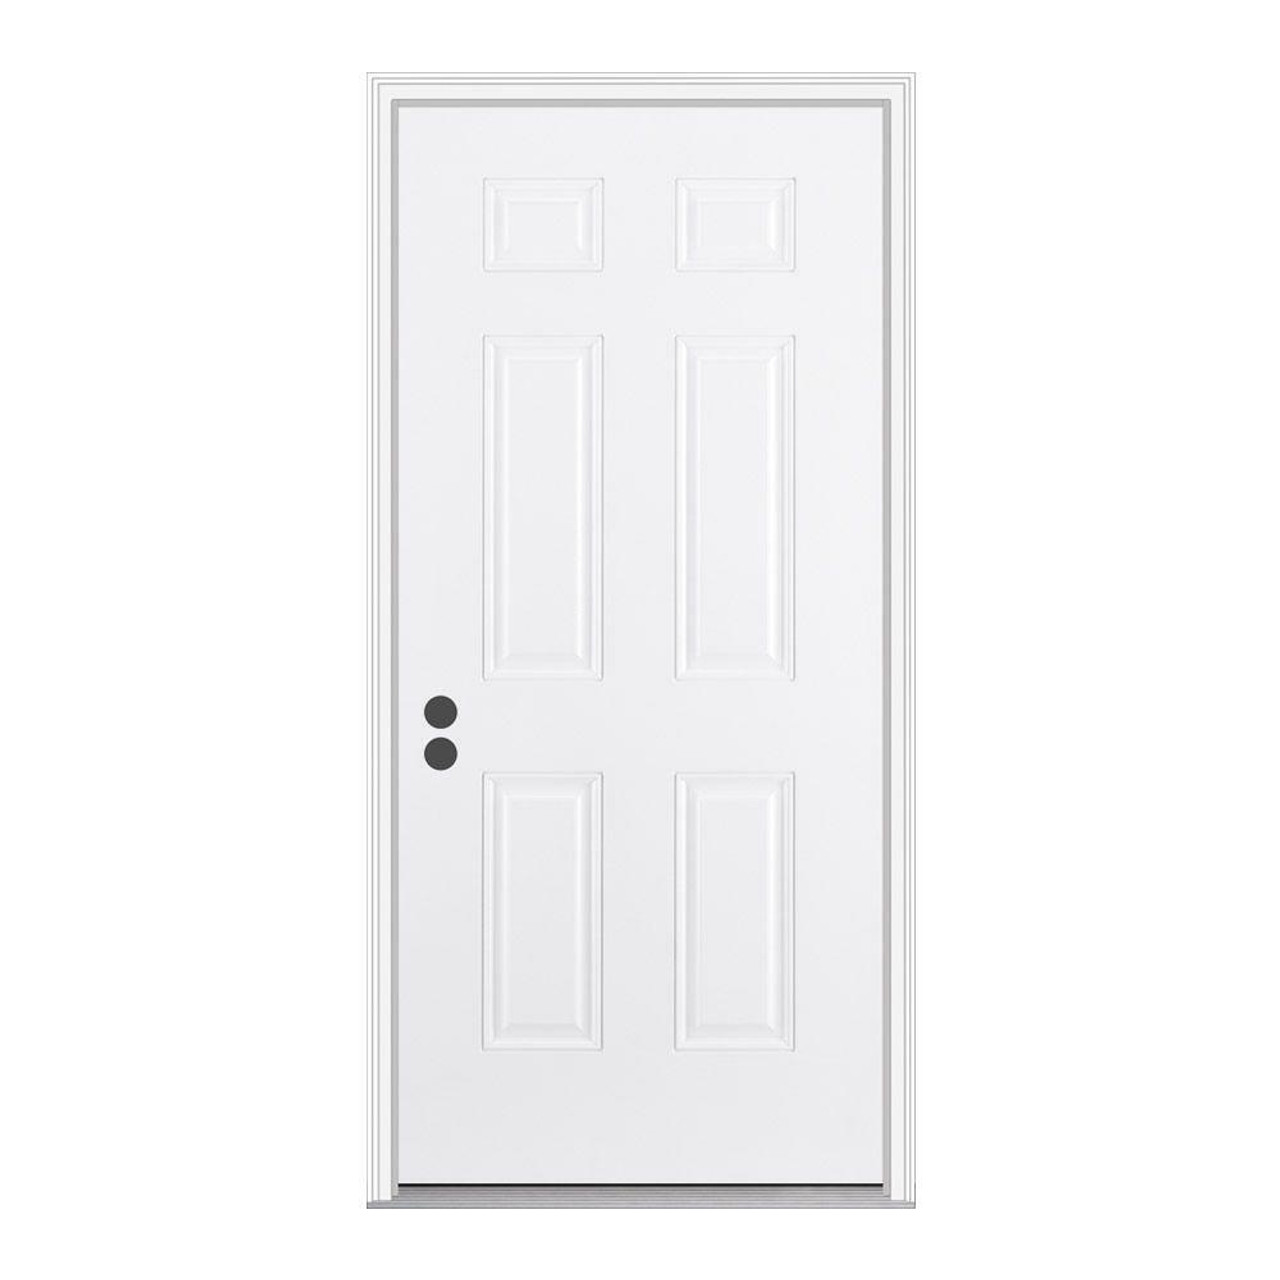 House-Type Inswing Doors